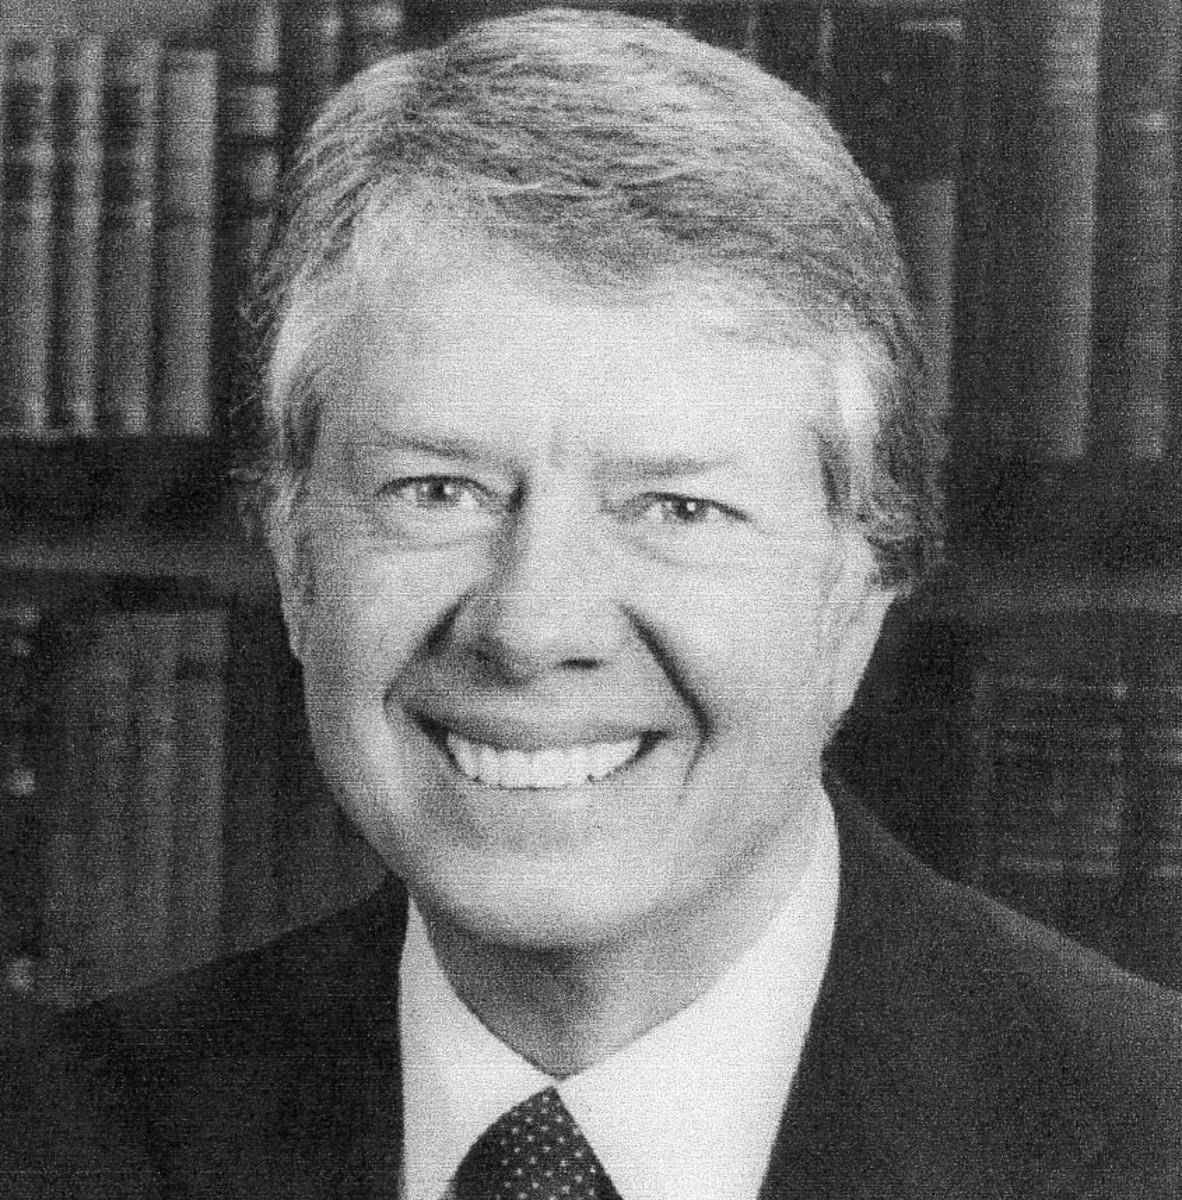 Jimmy Carter, the thirty-ninth president, Democrat, 1977-1981